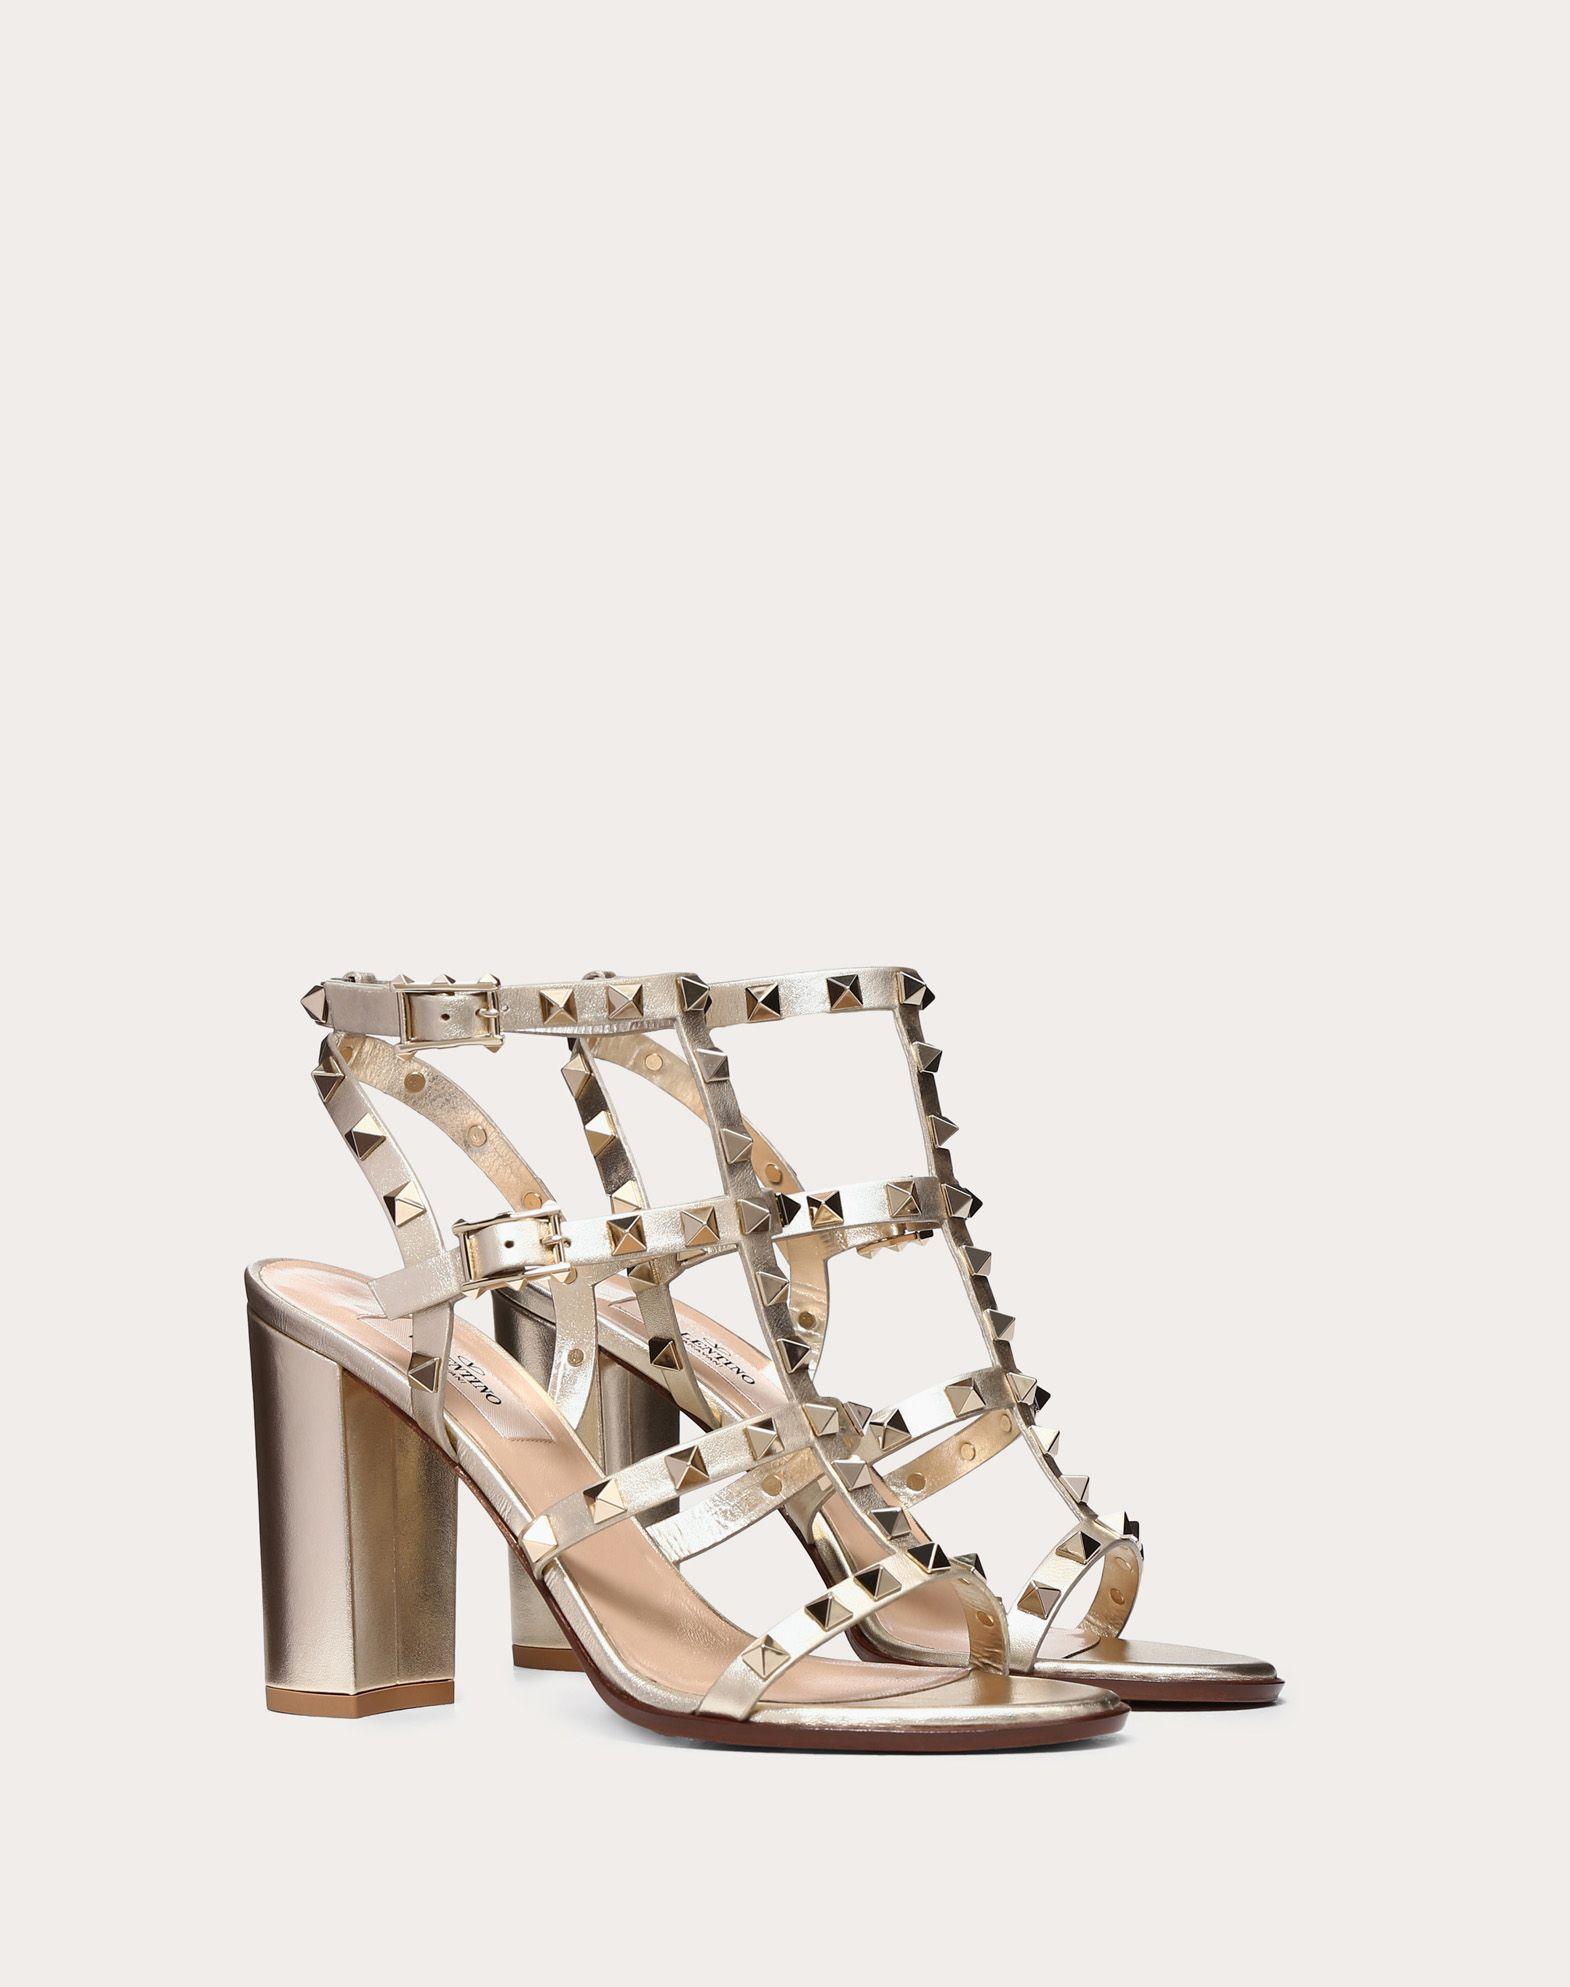 VALENTINO GARAVANI Rockstud Sandal HIGH HEEL SANDALS D r